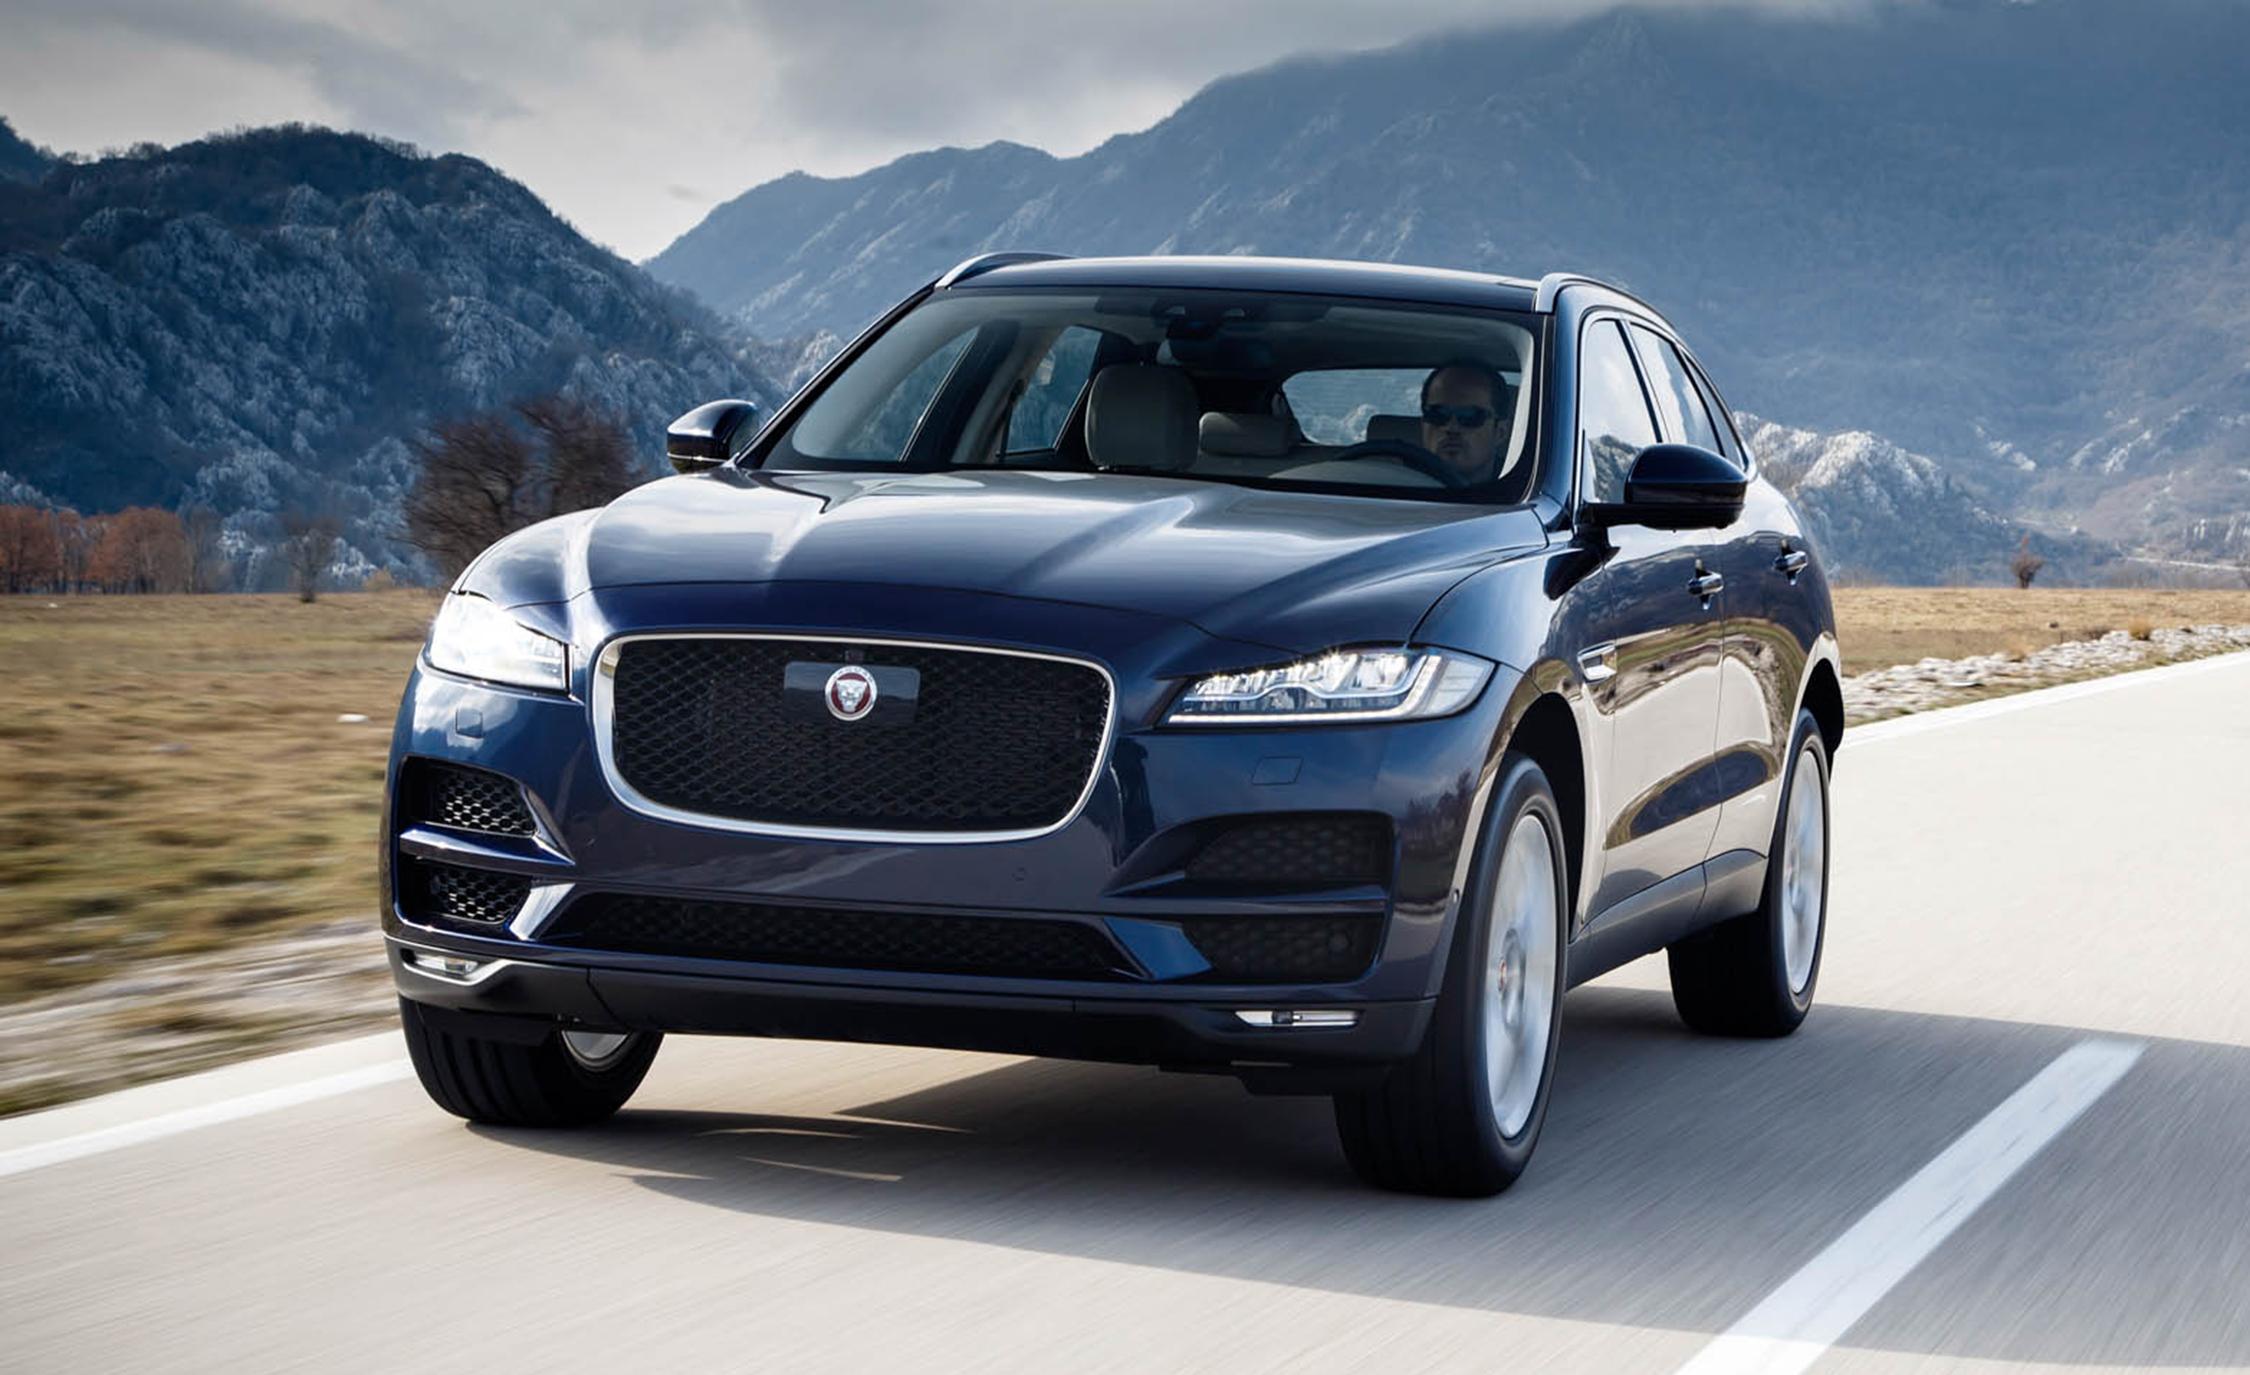 Gelecek Senelere Damga Vuracak SUV Modeller Jaguar J-Pace